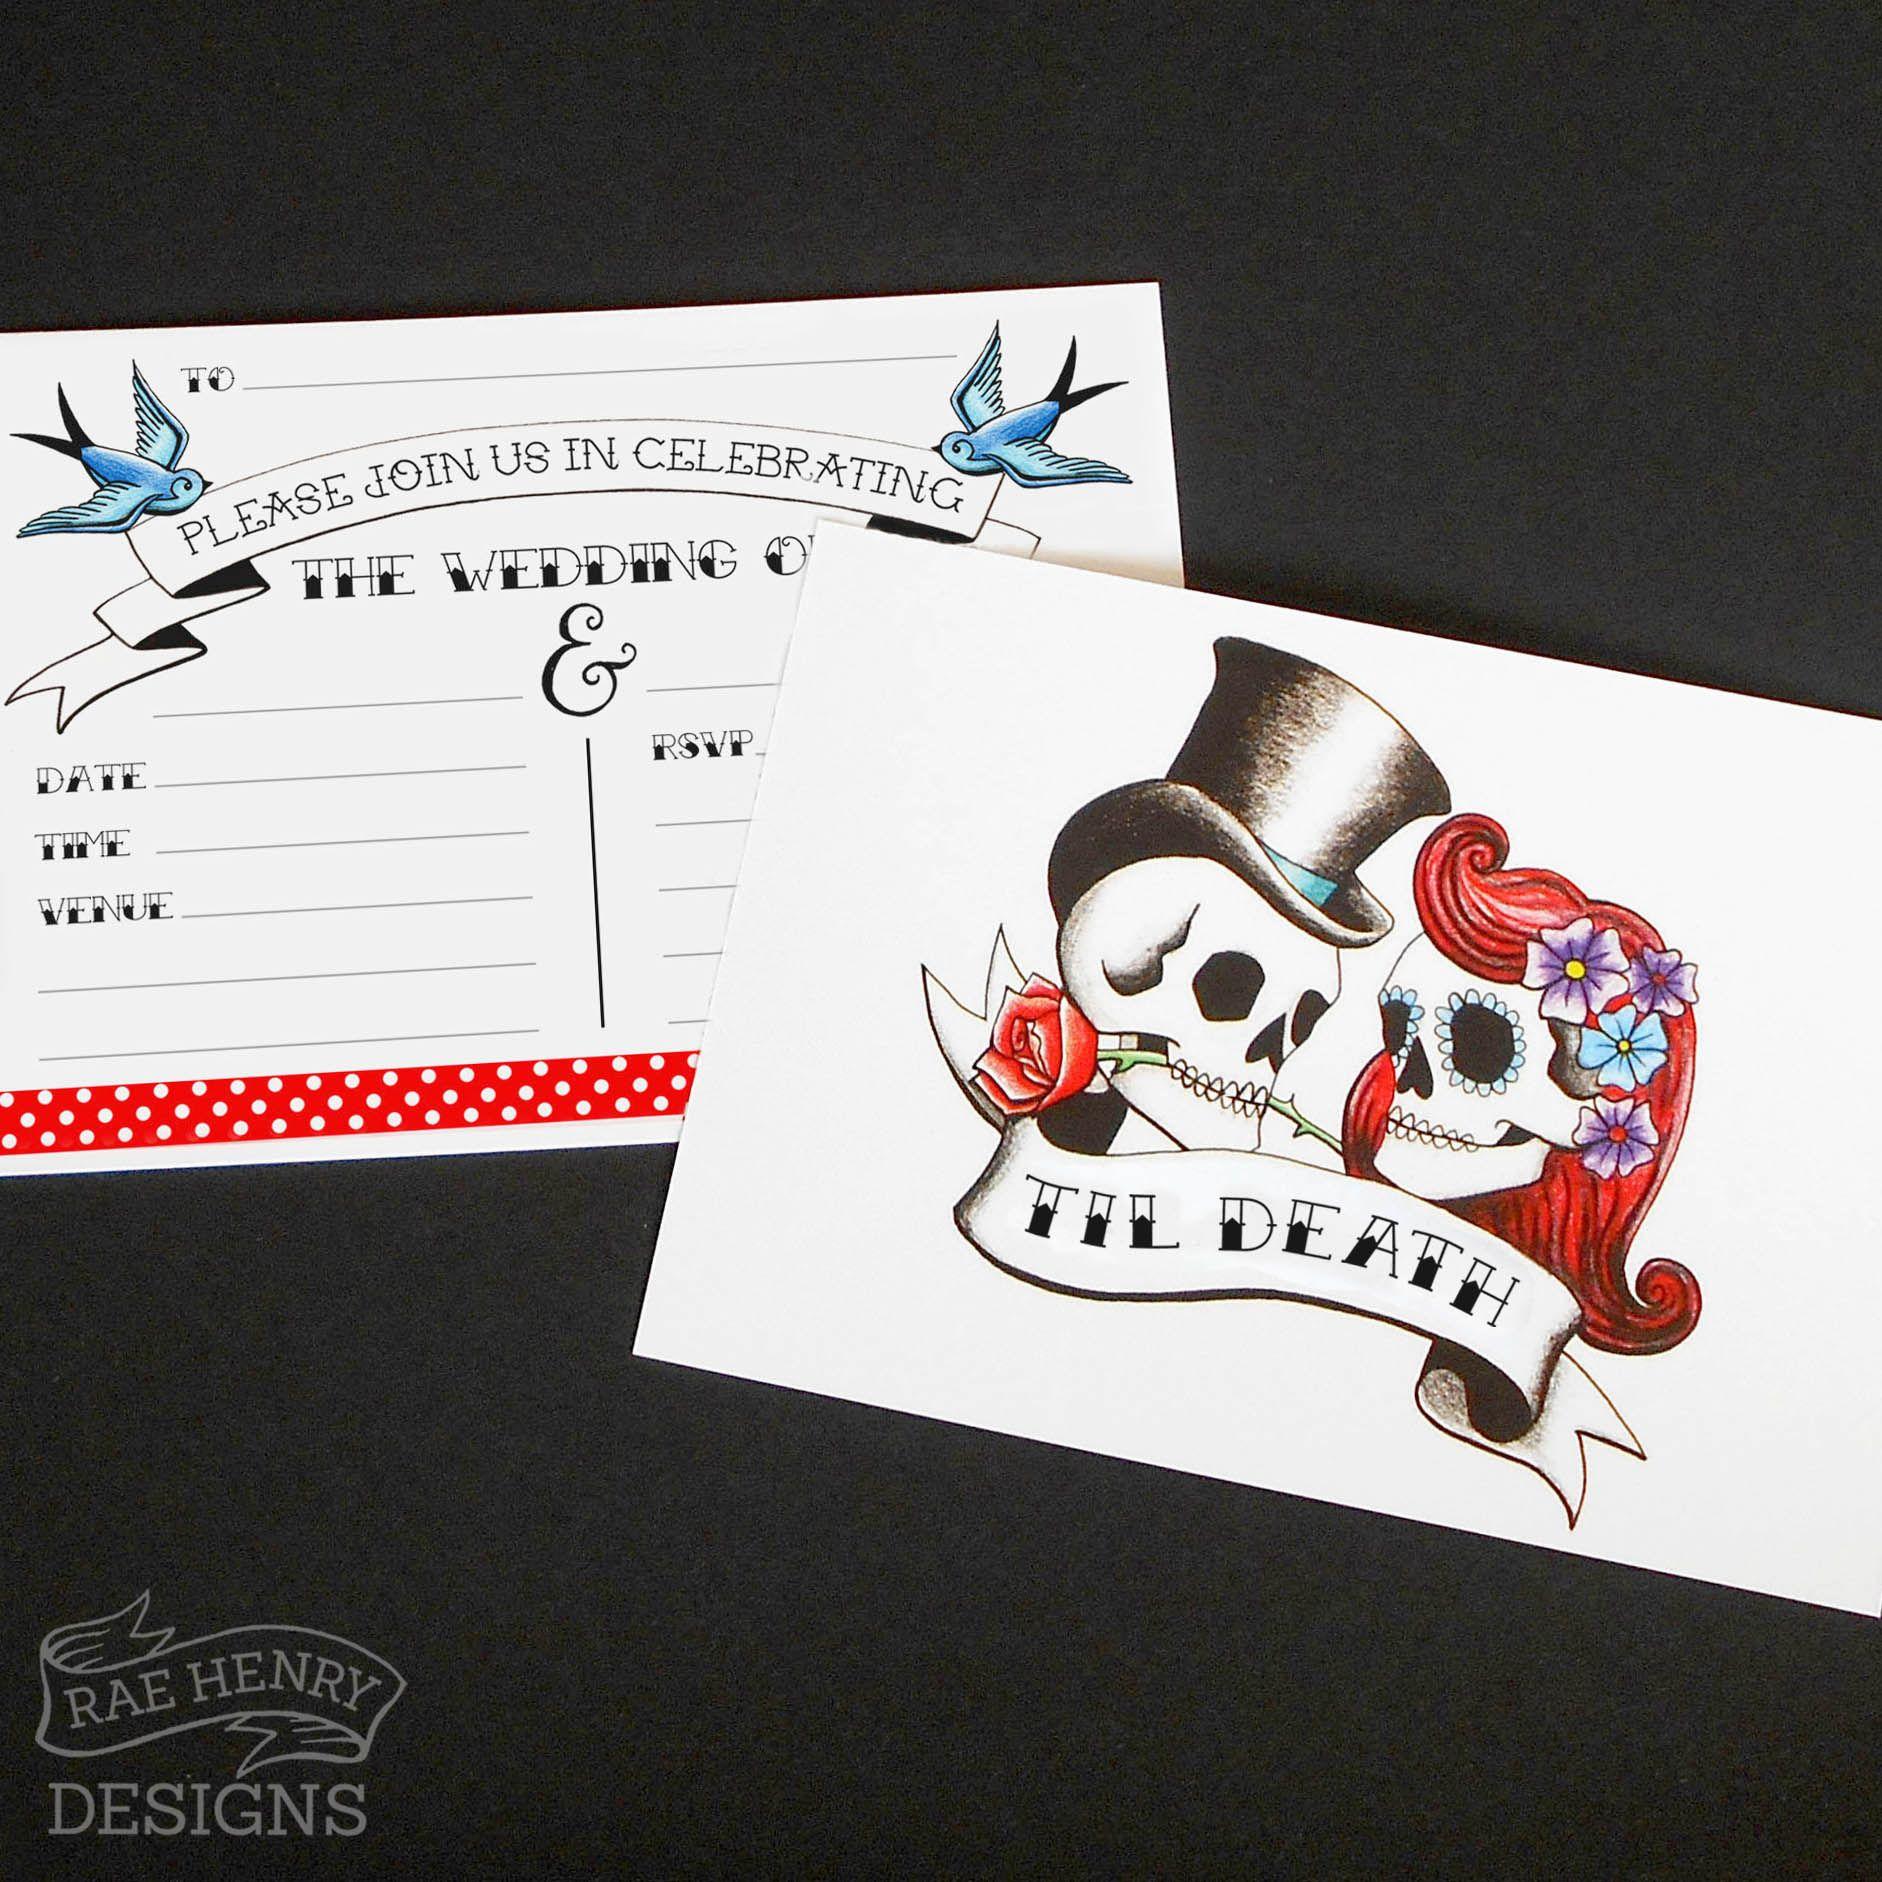 Rockabilly Skulls Swallows Tattoo Wedding Invitations By Rae Henry Designs